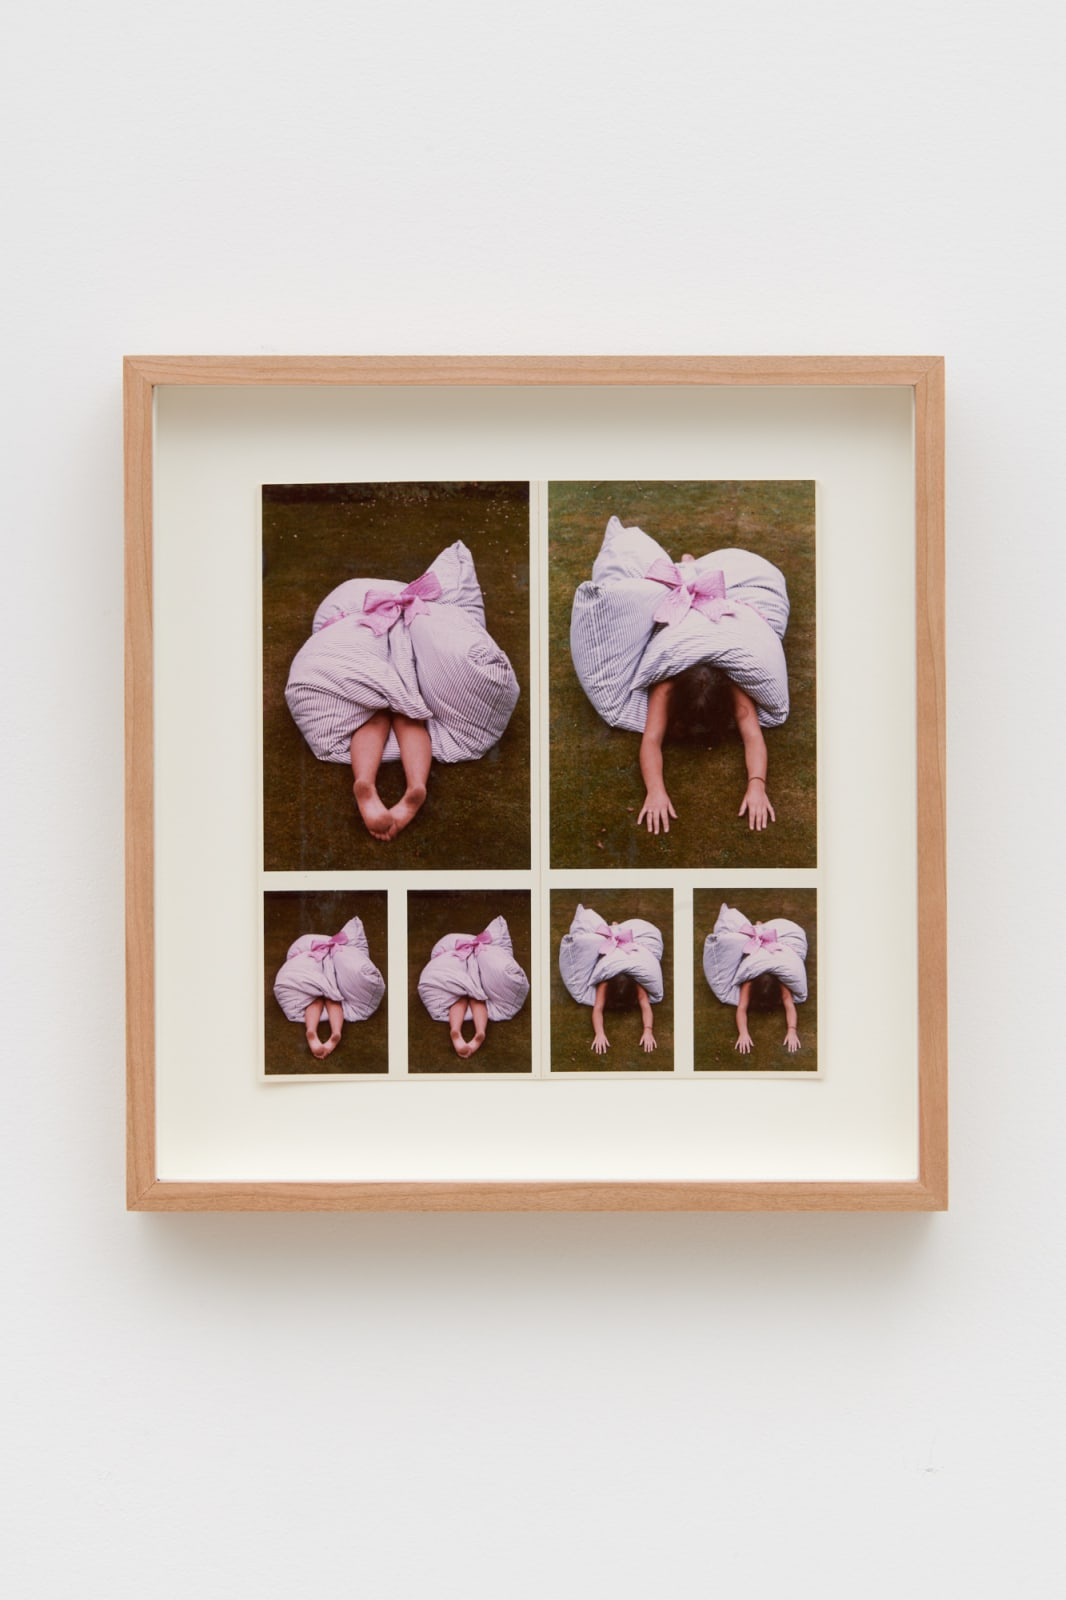 Rose ENGLISH, Baroque Harriet study (feather mattress), 1973